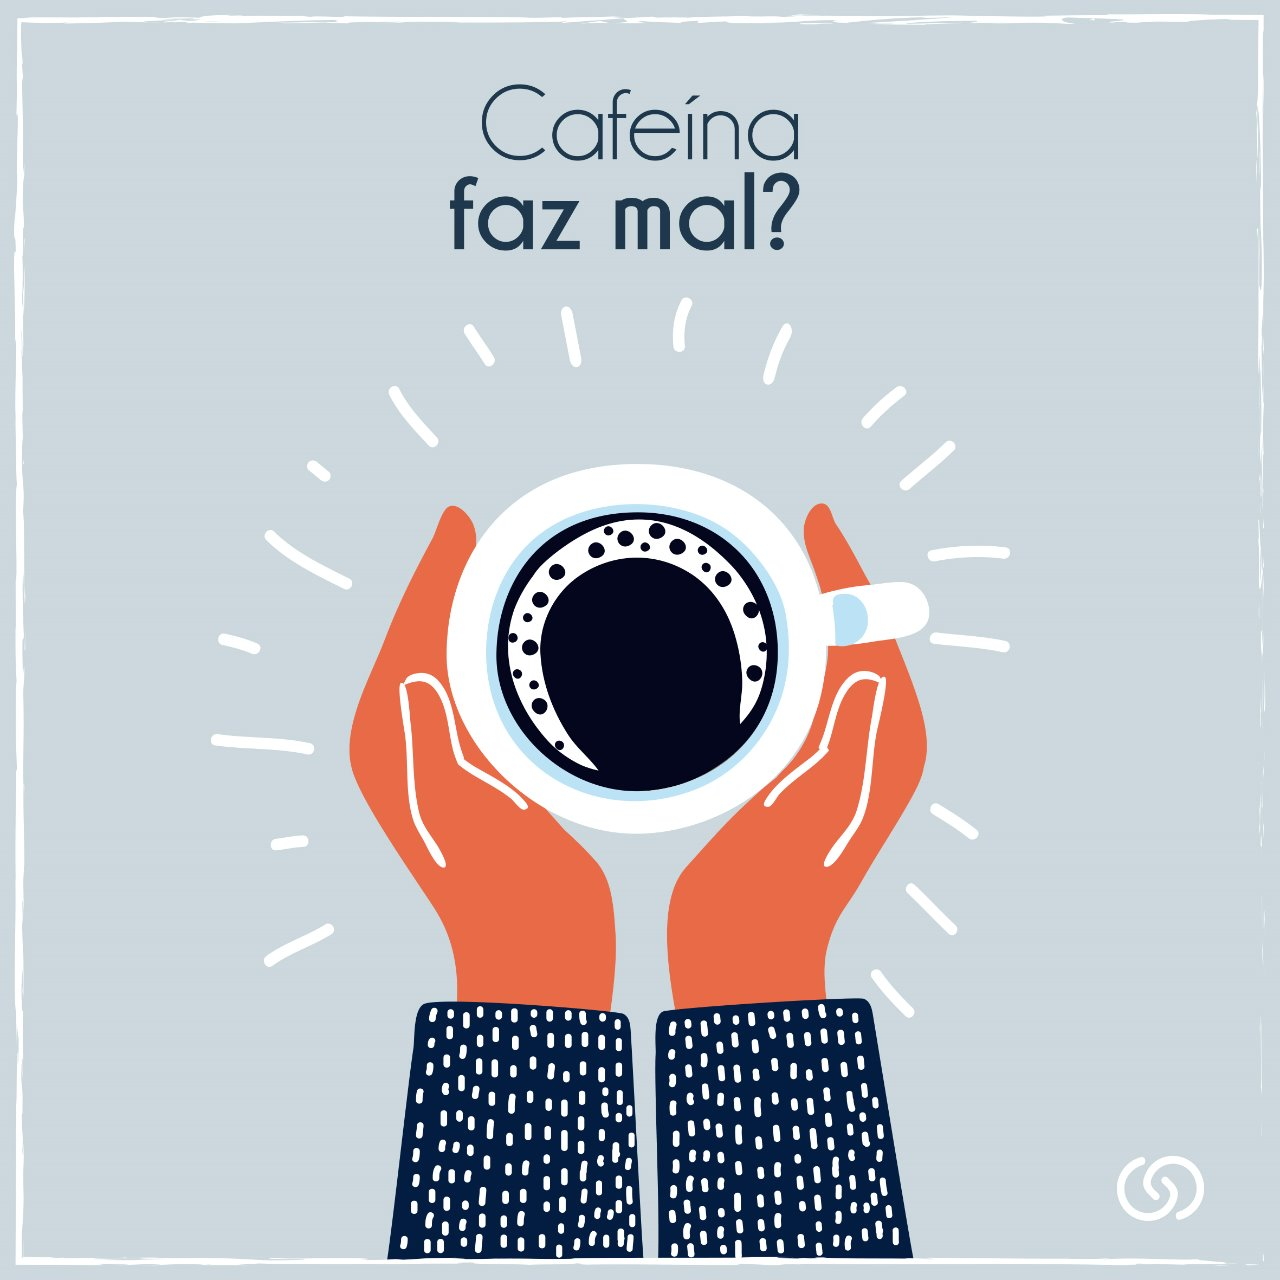 Cafeína faz mal?